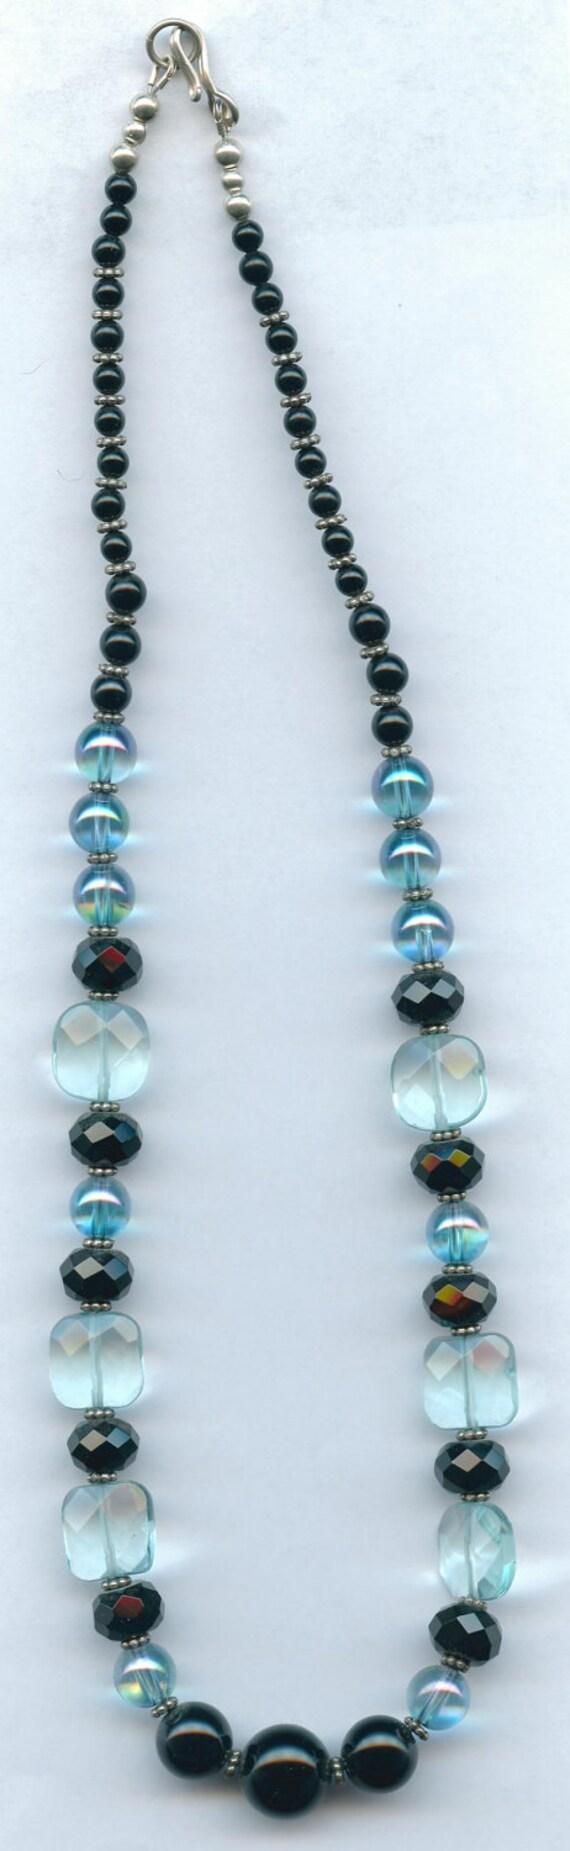 Aquamarine and Black Tourmaline Protection Necklace with  Iridescent Aqua Aura and Onyx Beads